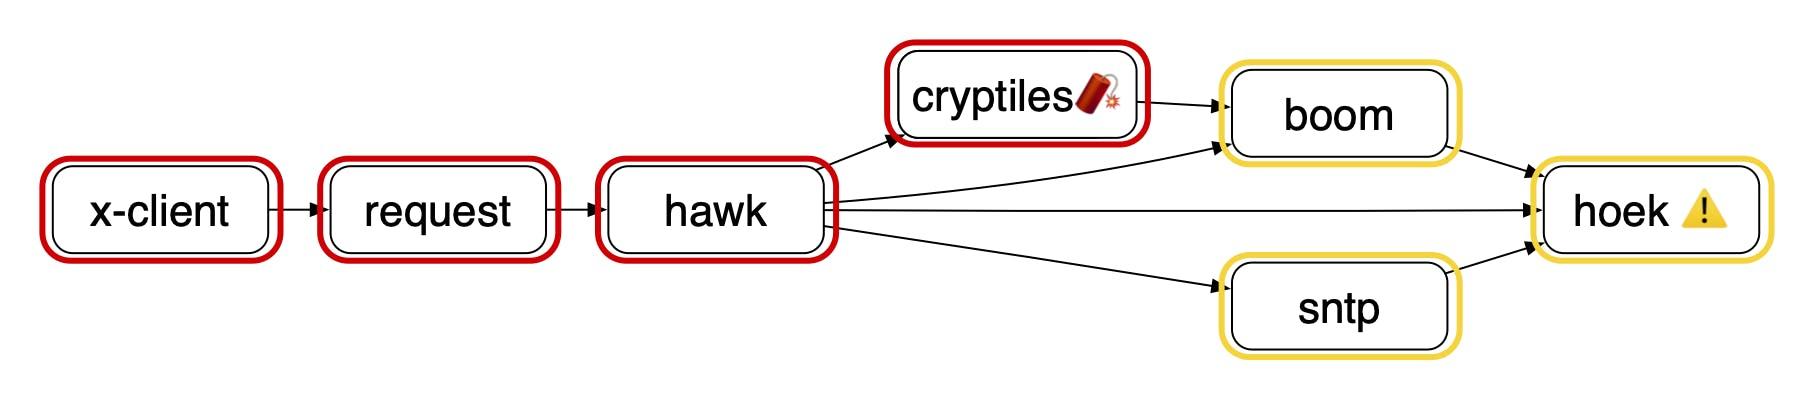 vulnerabilitiesv7overlayx.png